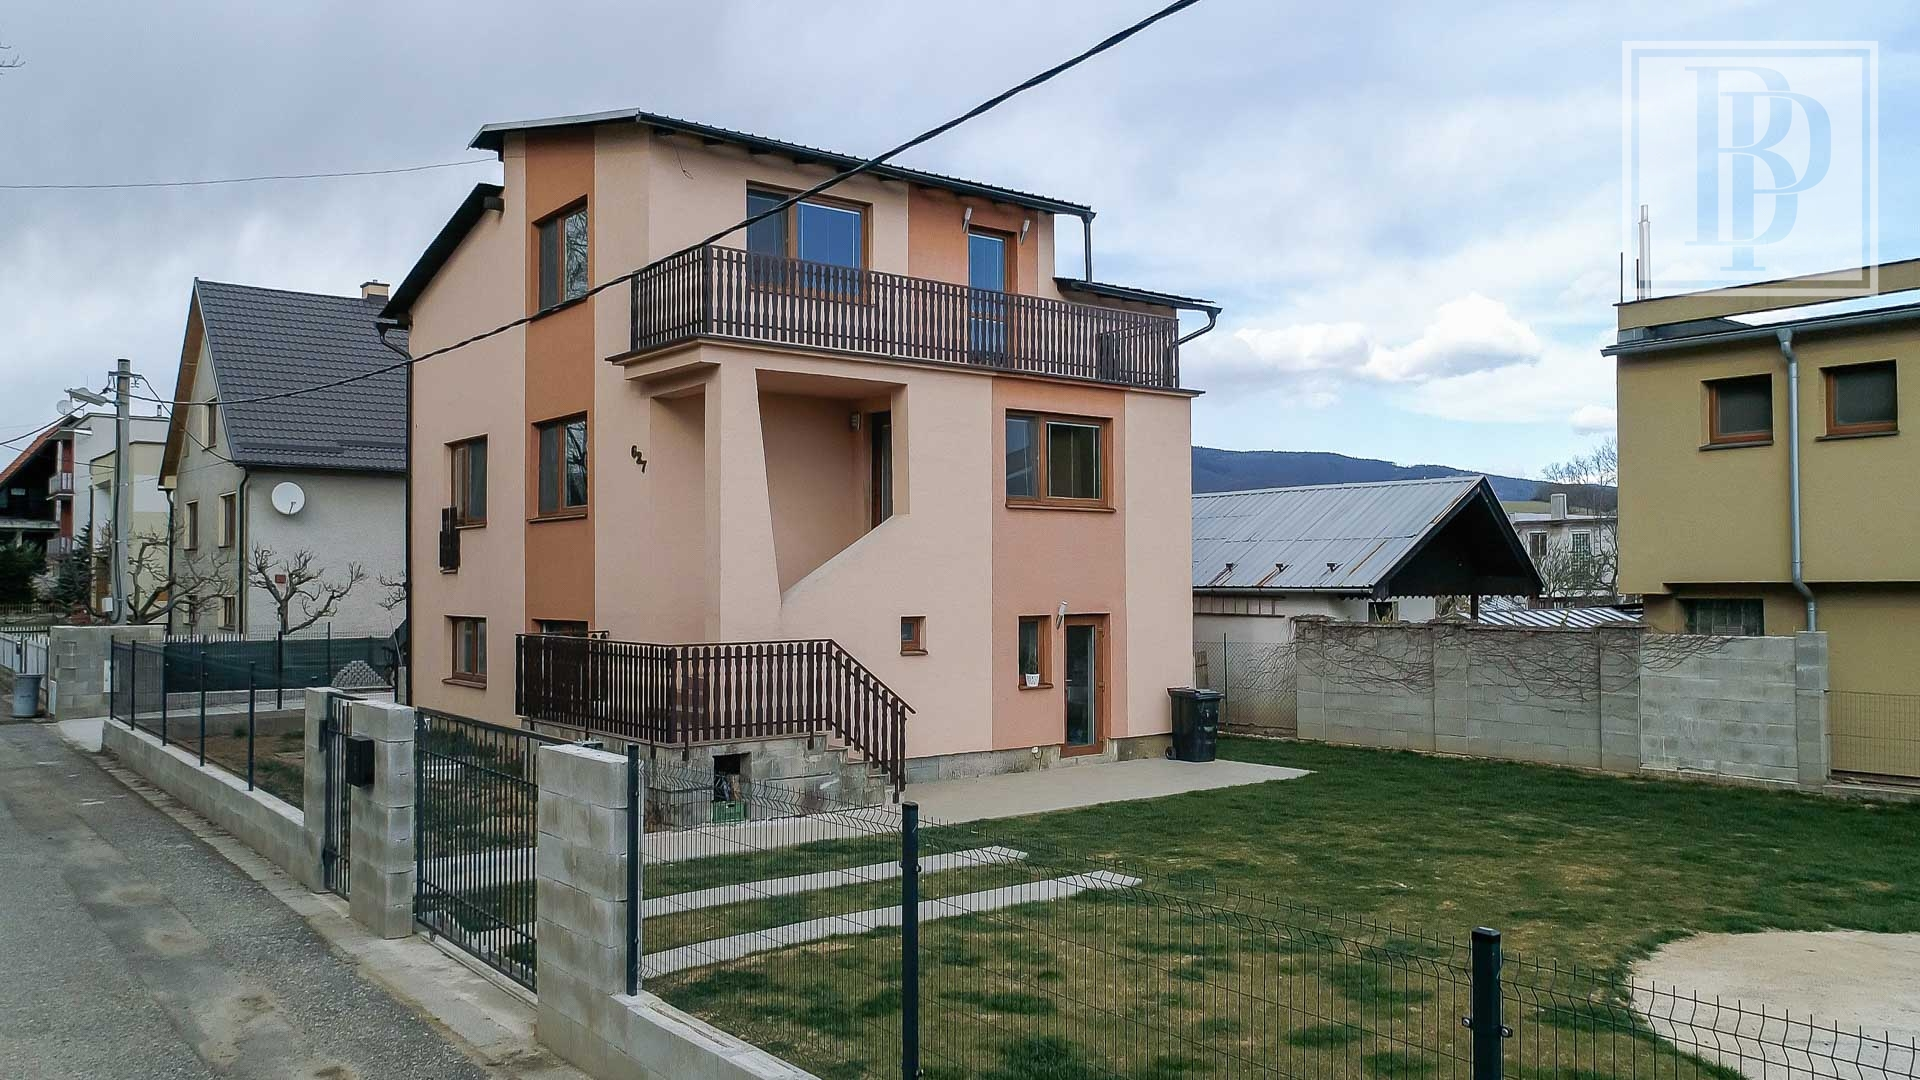 Rodinny-dom-Jeskova-Ves-nad-Nitricou-04082021_170001